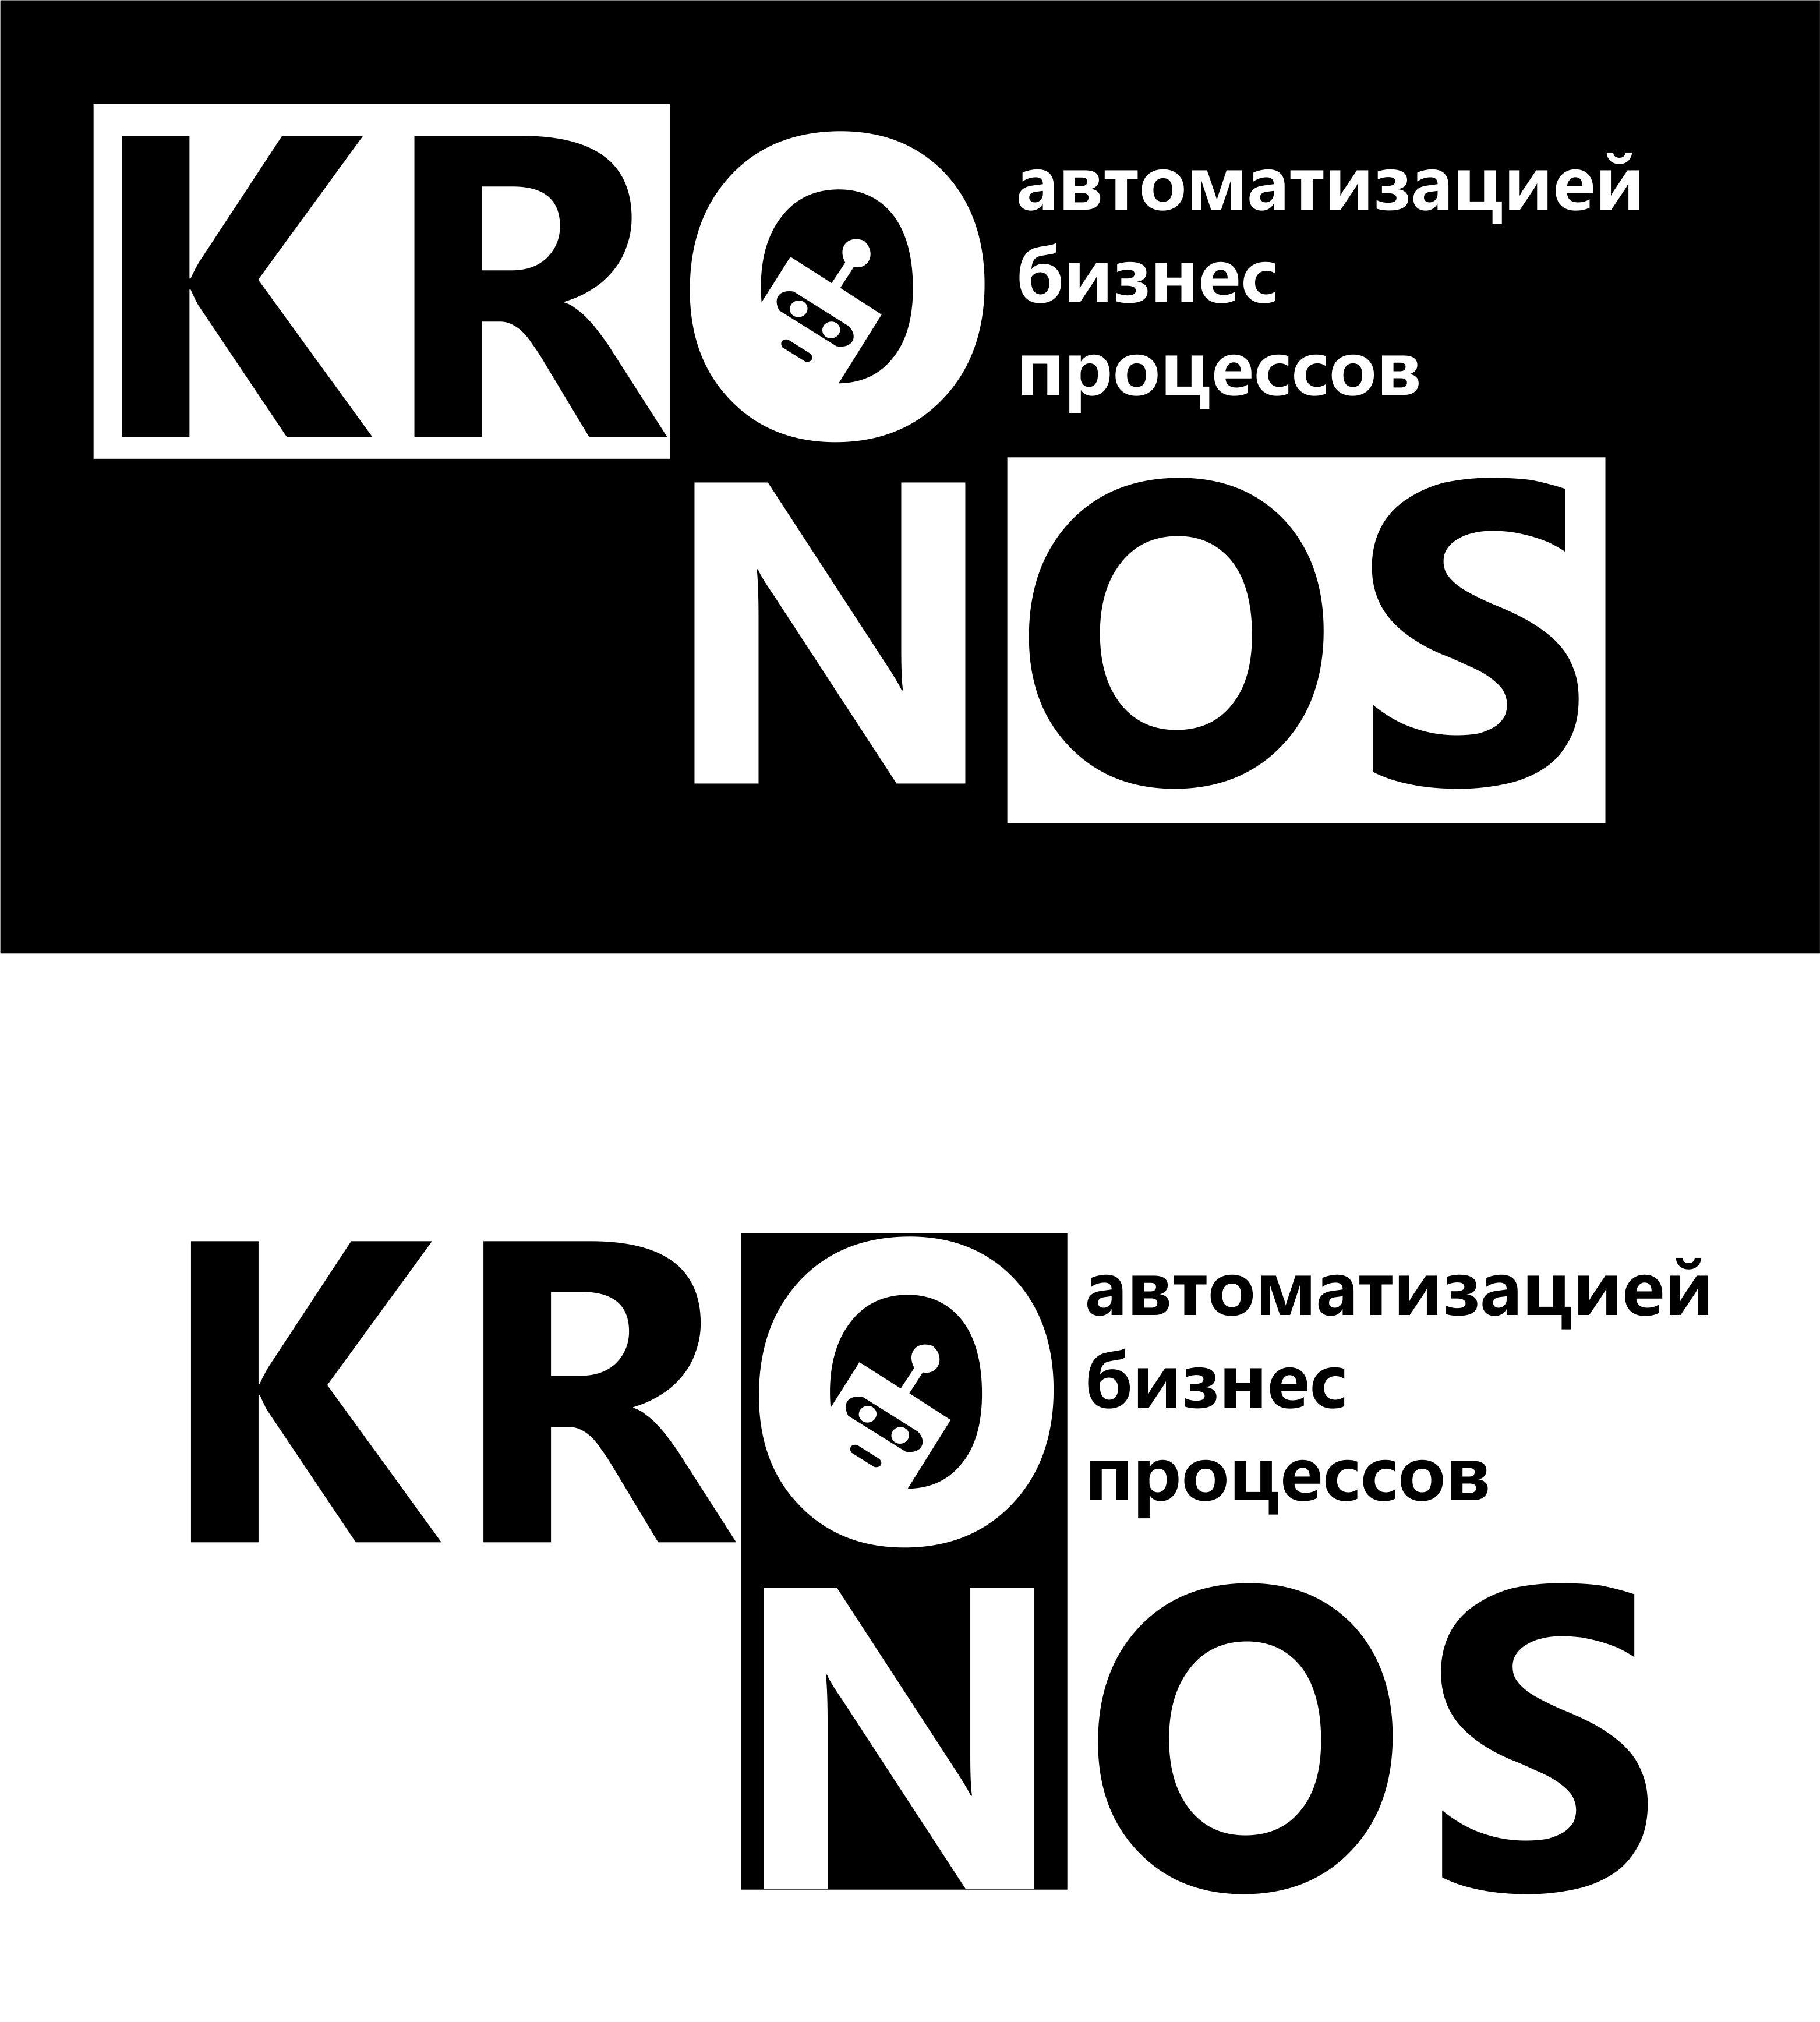 Разработать логотип KRONOS фото f_6425fafee8f64194.jpg